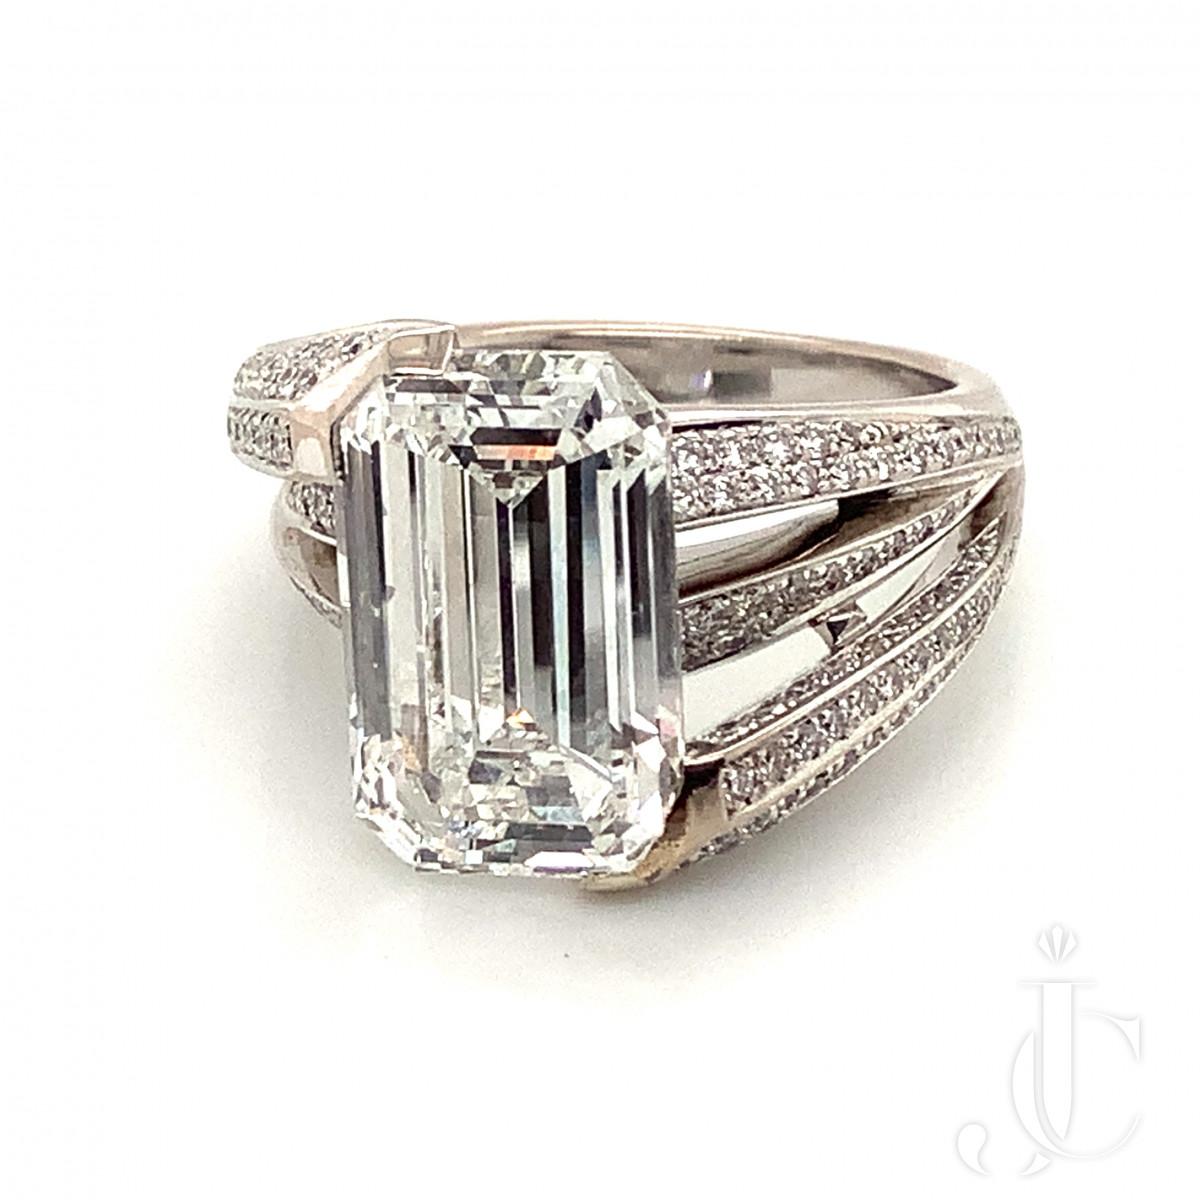 Fred Paris 5.04ct F VS1 Diamond Ring